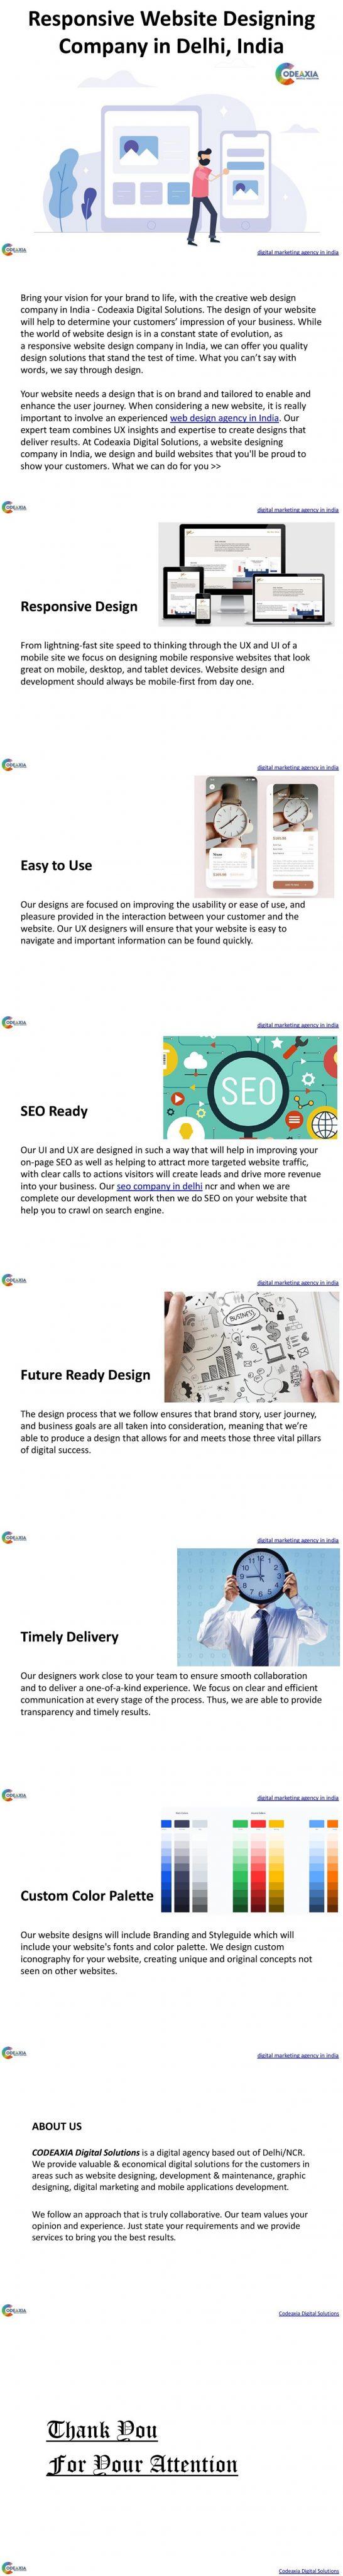 Responsive Website Designing Company in Delhi, India